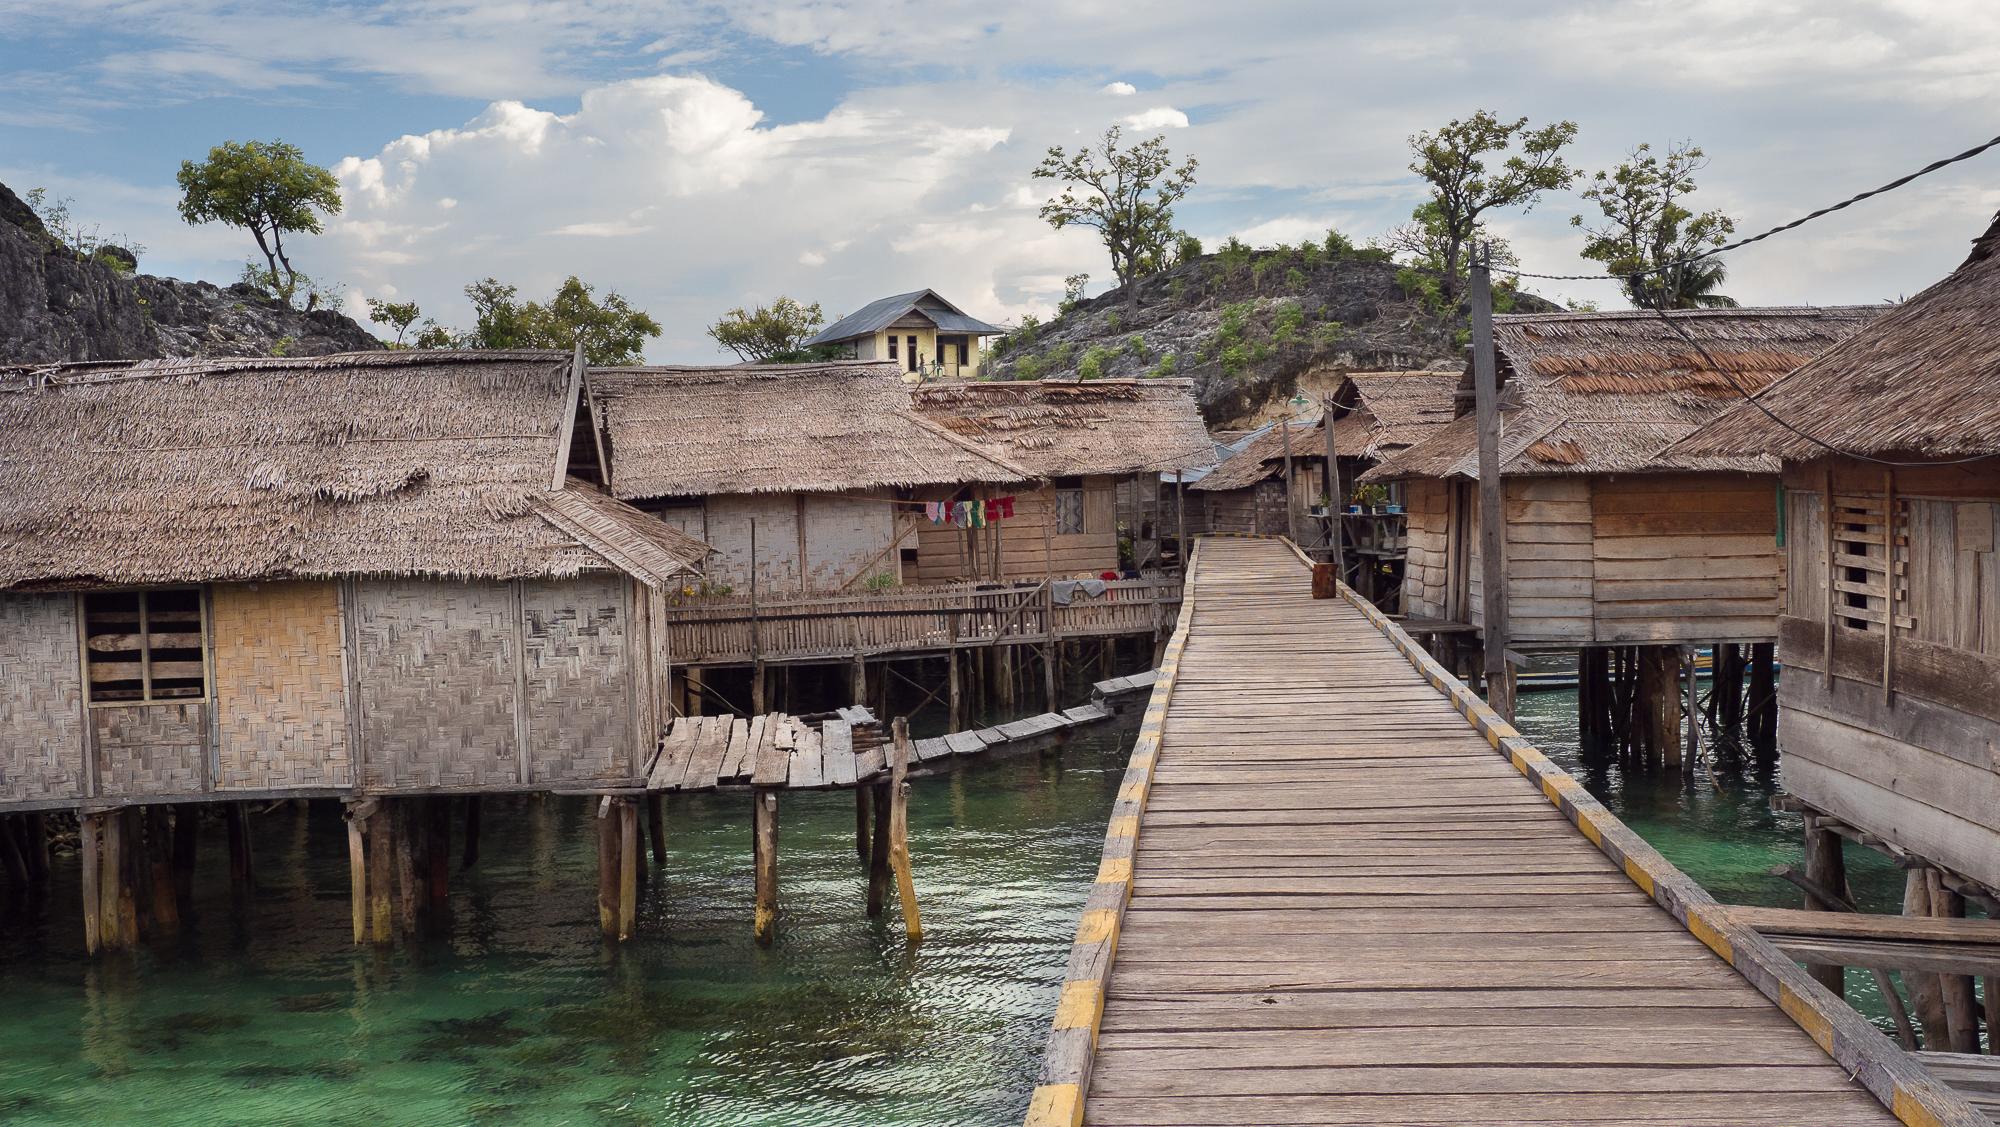 Bajo village (sea gipsy), Indonesia